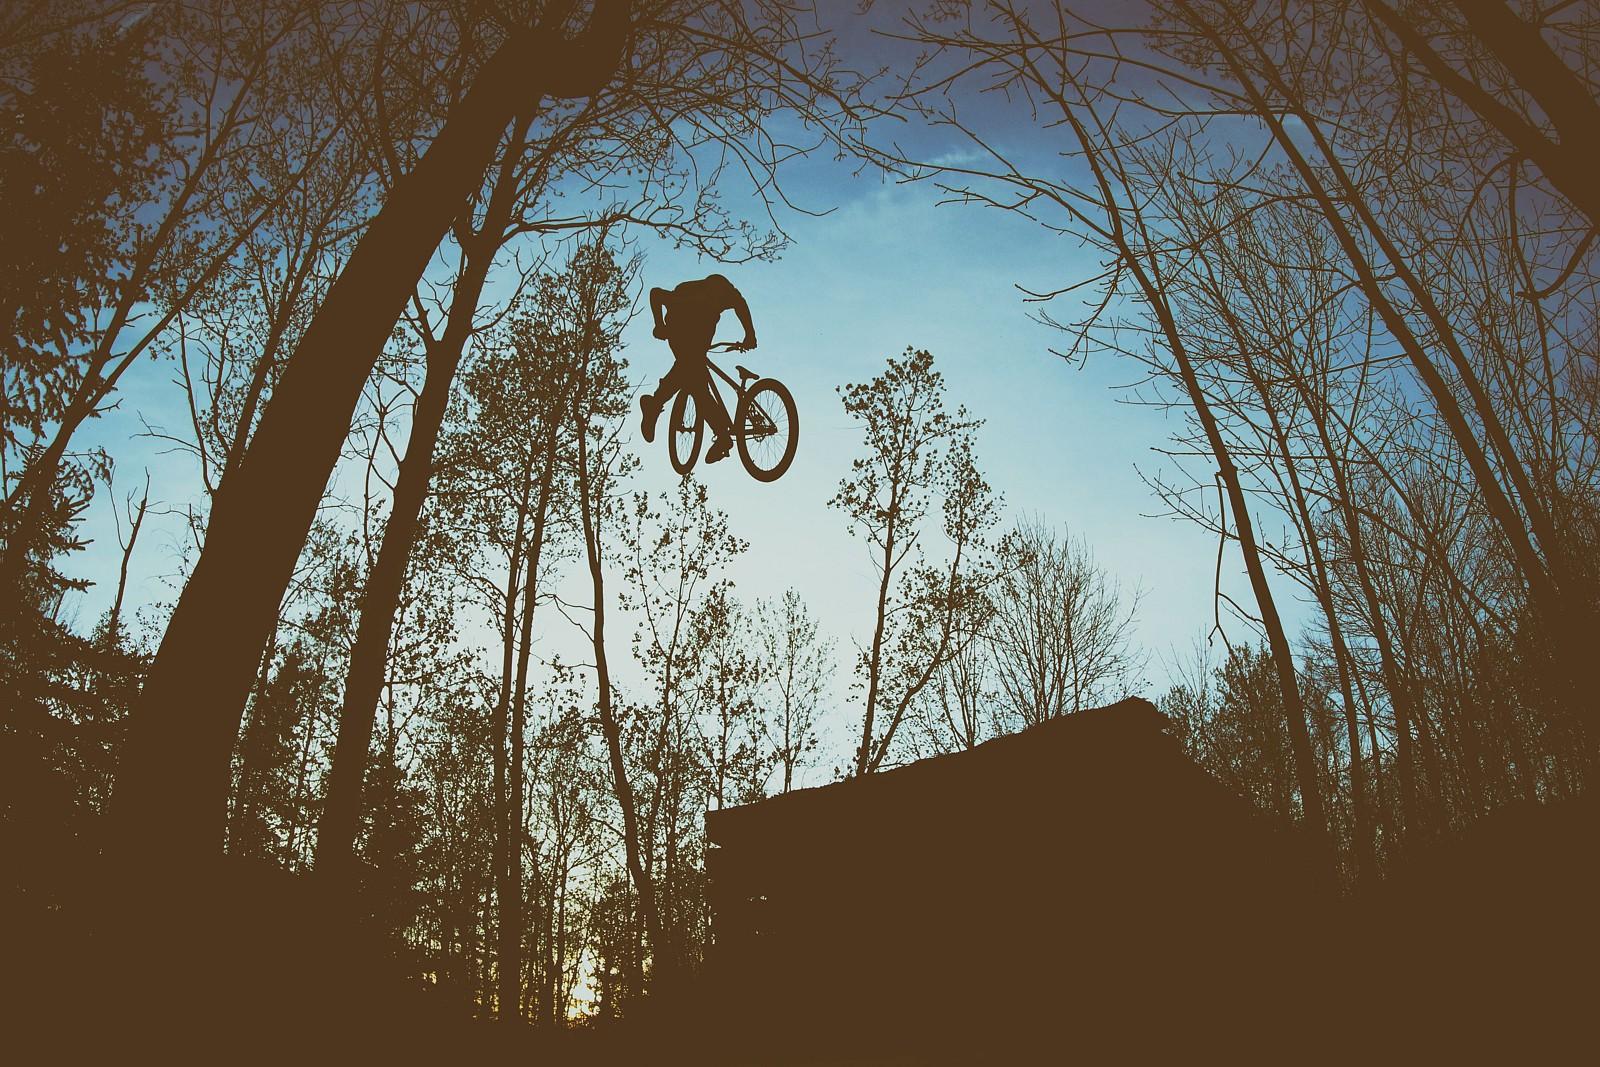 nacnac - philippemarceau - Mountain Biking Pictures - Vital MTB